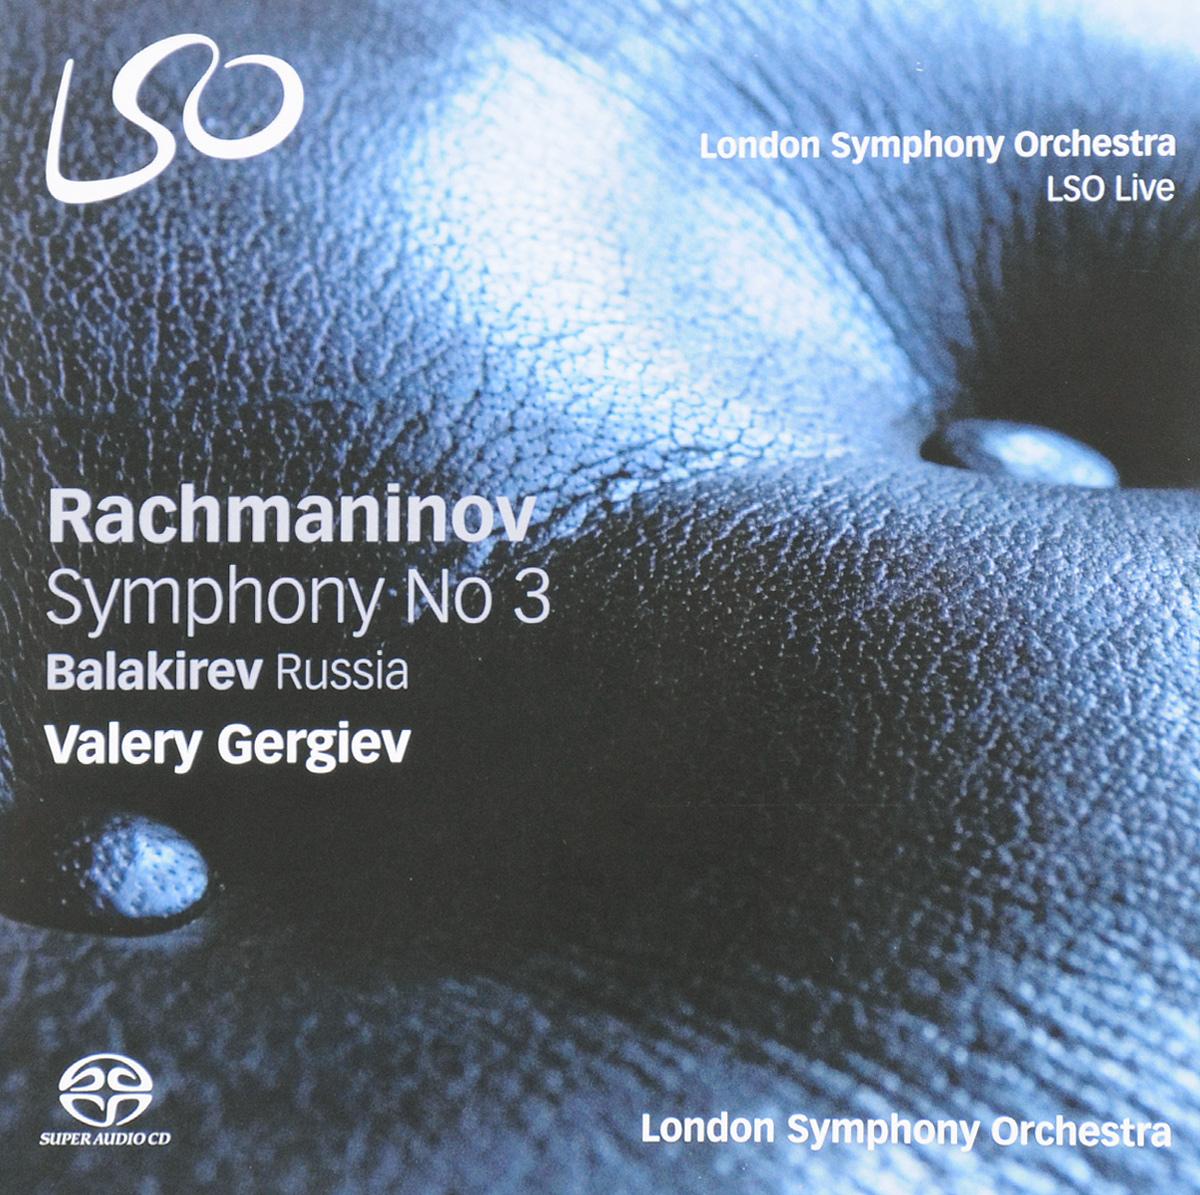 Валерий Гергиев,The London Symphony Orchestra Valery Gergiev. Rachmaninov. Symphony No. 3 / Balakirev. Russia (SACD)